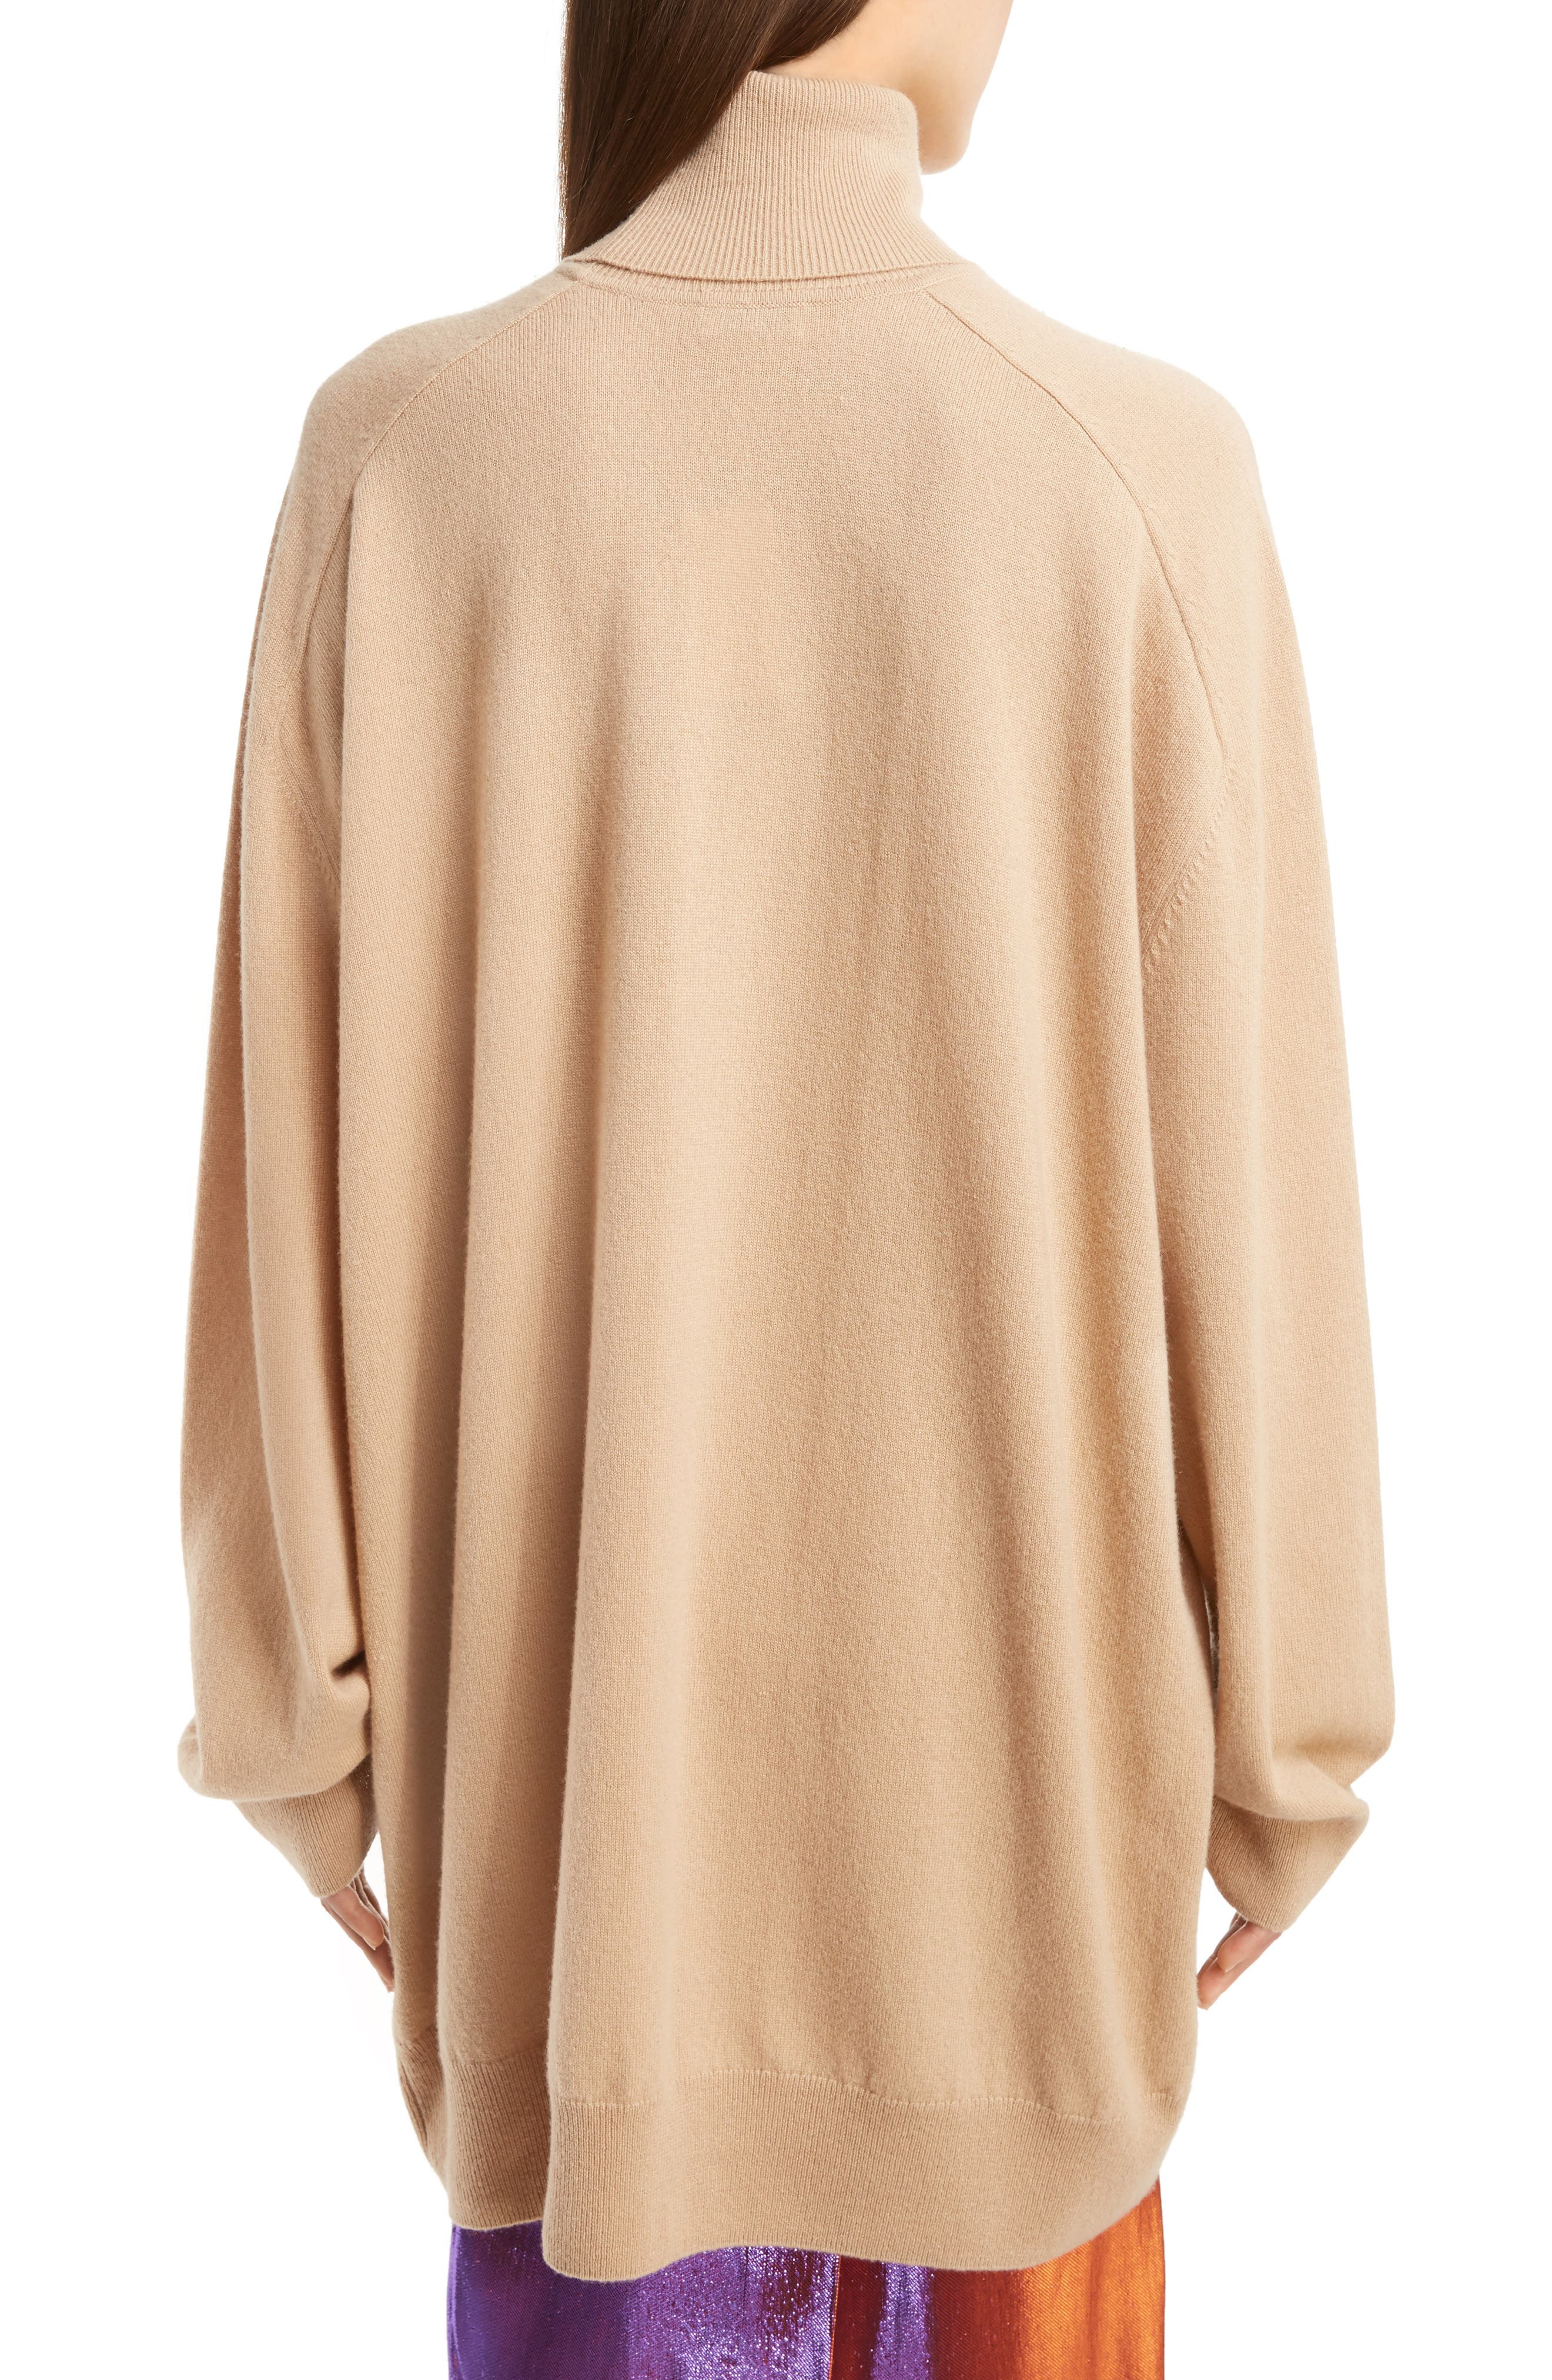 Oversized Cashmere Turtleneck Sweater,                             Alternate thumbnail 2, color,                             250